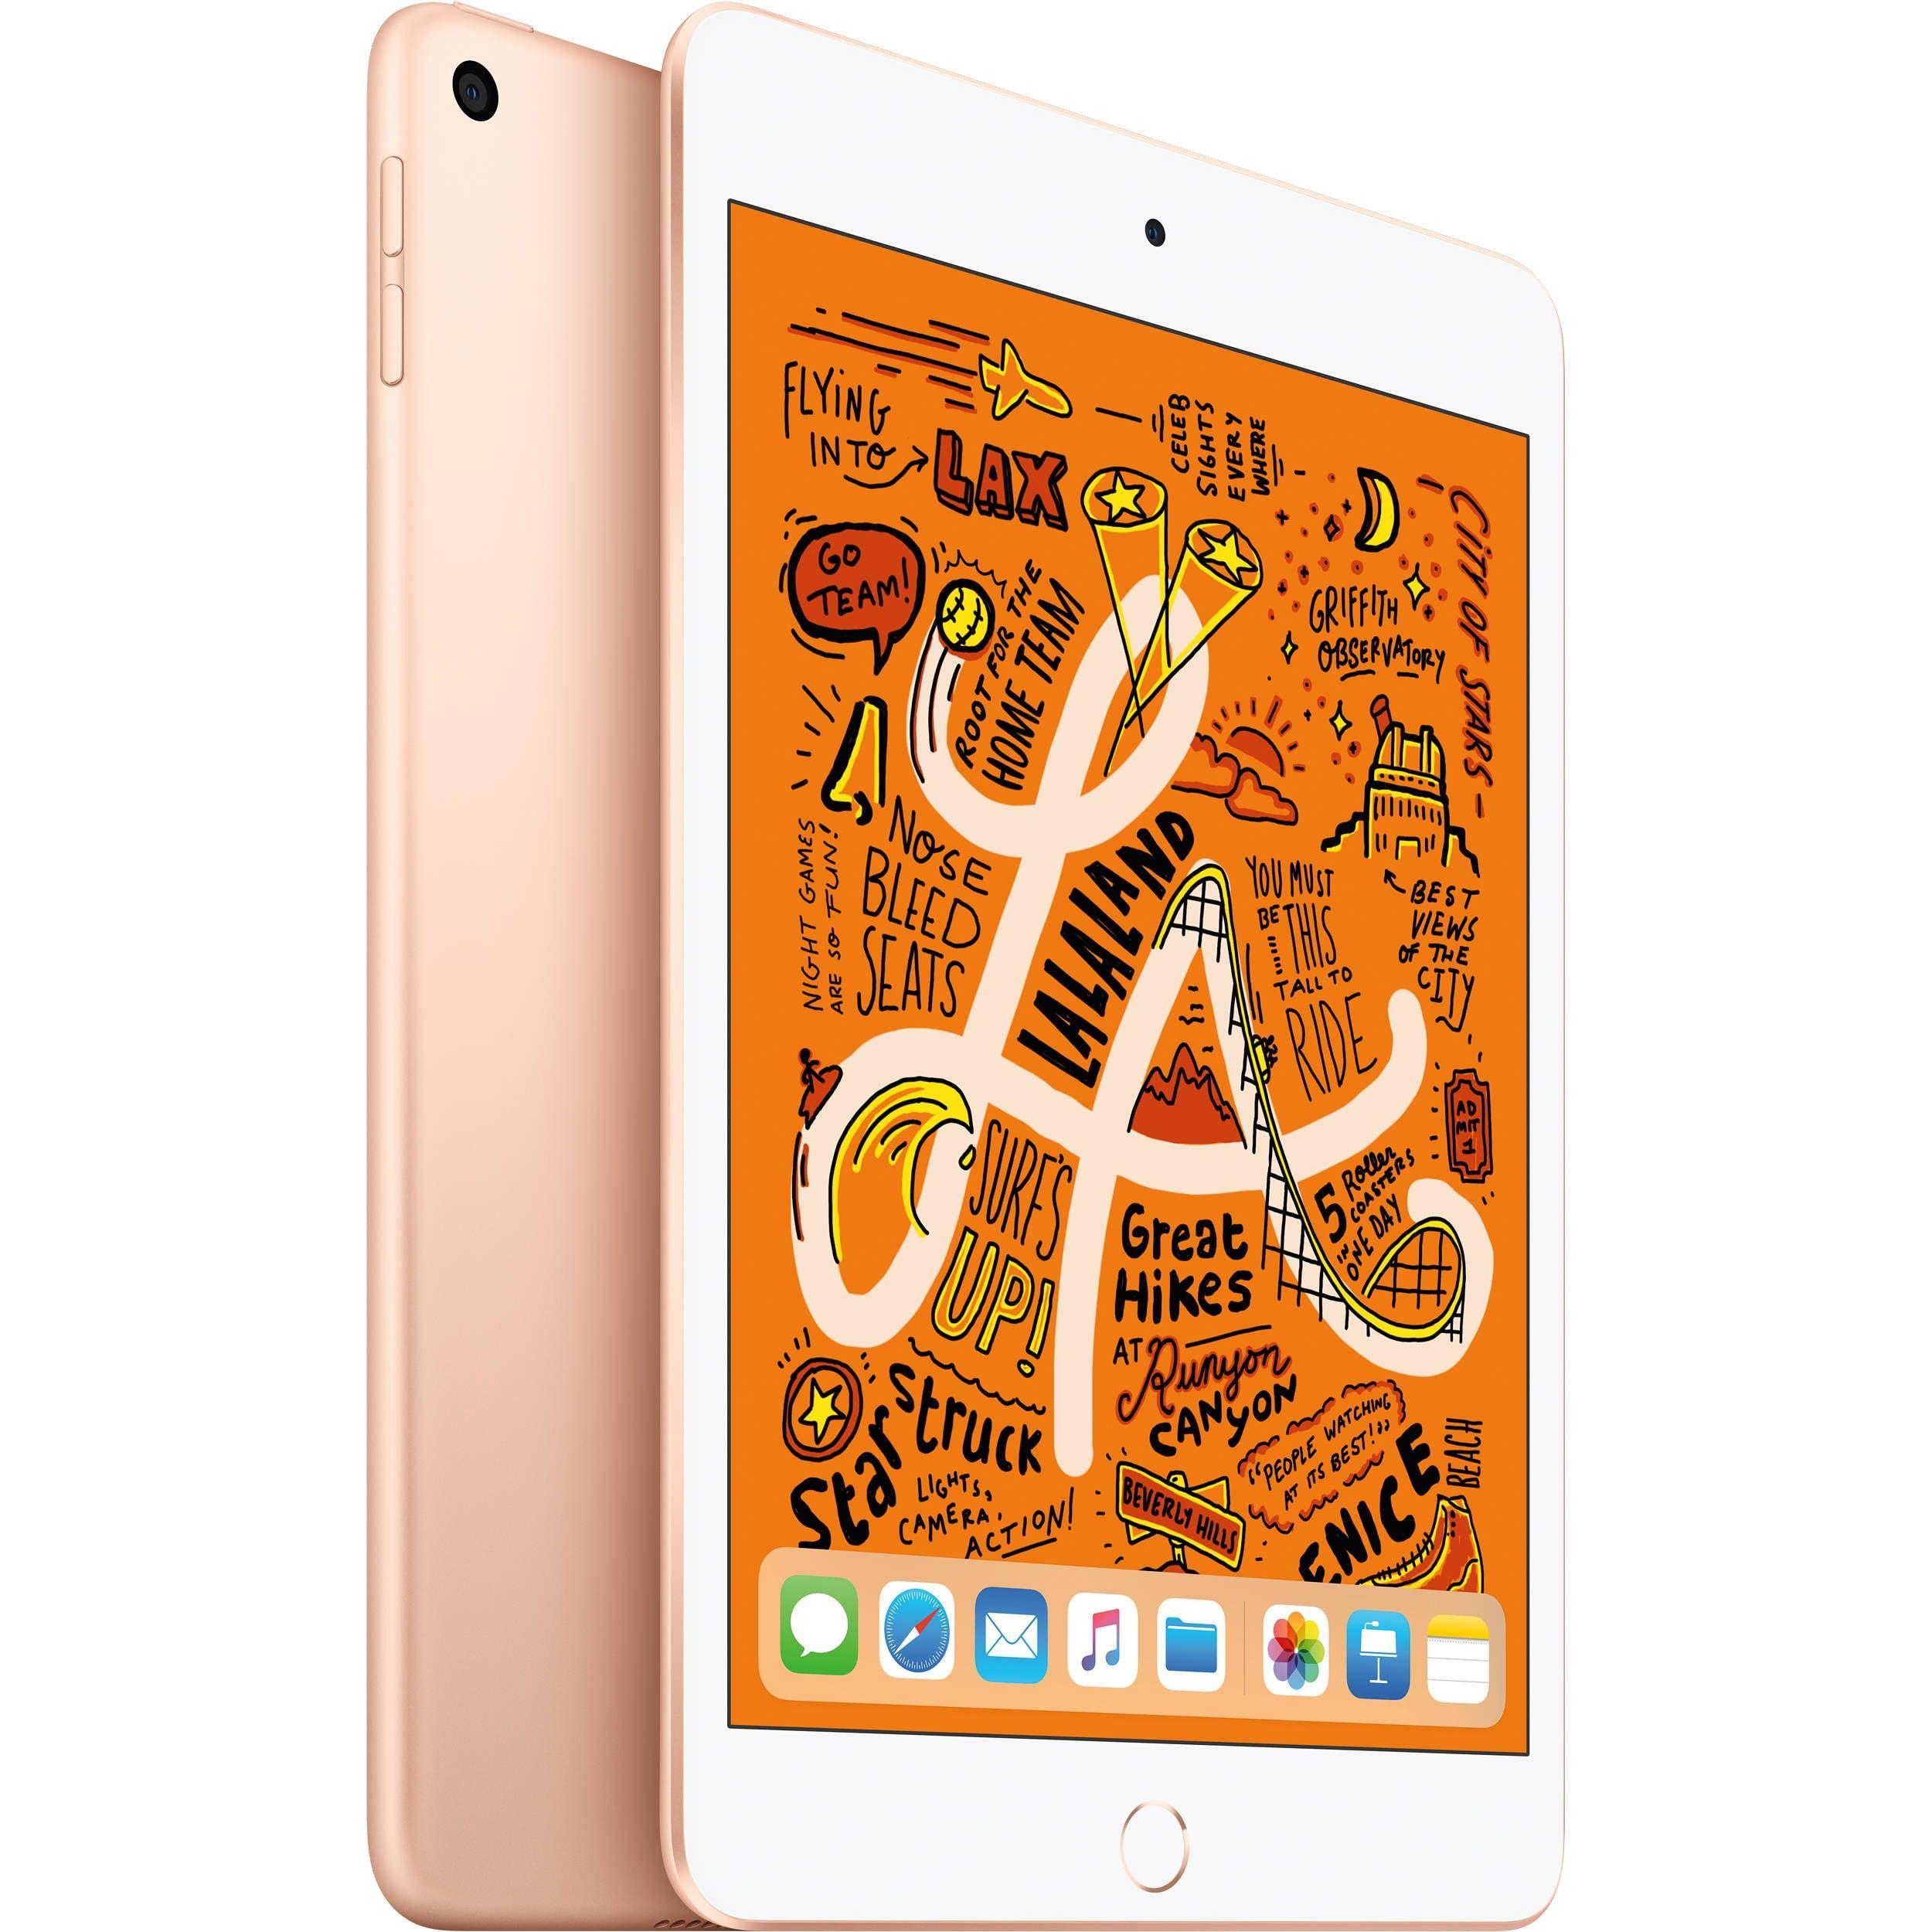 Apple iPad mini (2019) MUQY2 64GB Wifi - Oro (con 1 año de garantía oficial de Apple)